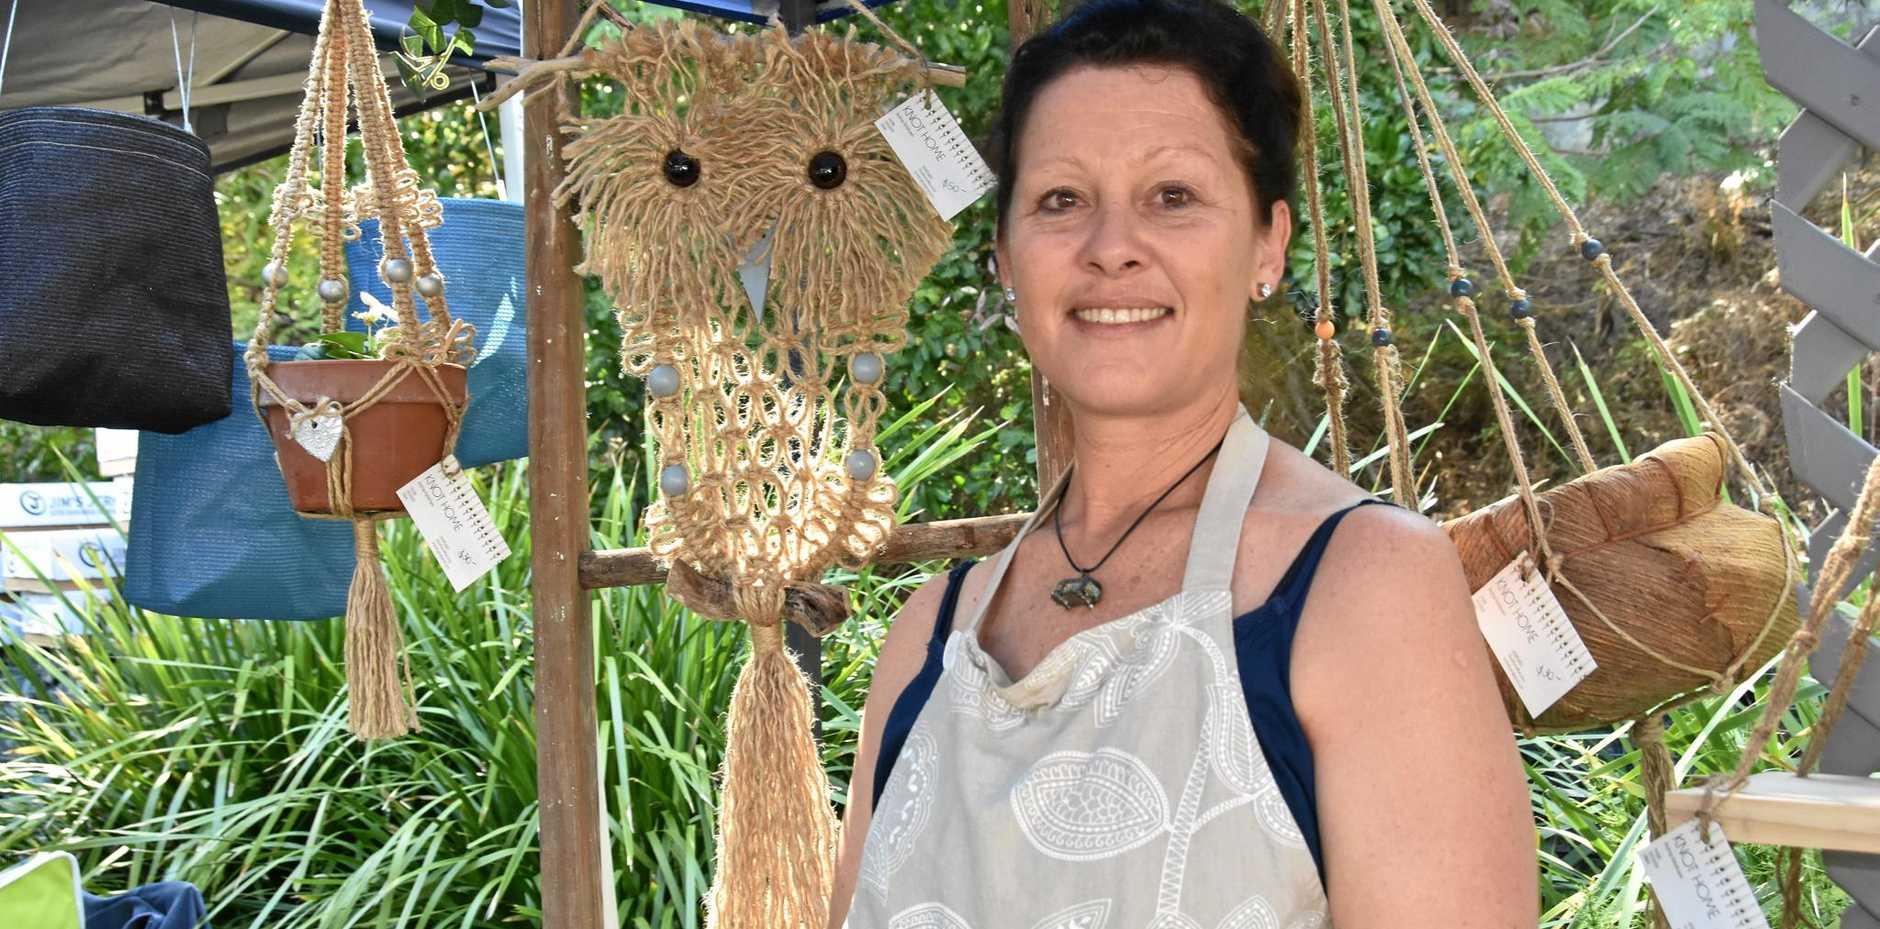 TOP KNOT: Gladstone macrame textiler Andrea Rohdmann's owl took three hours to make.